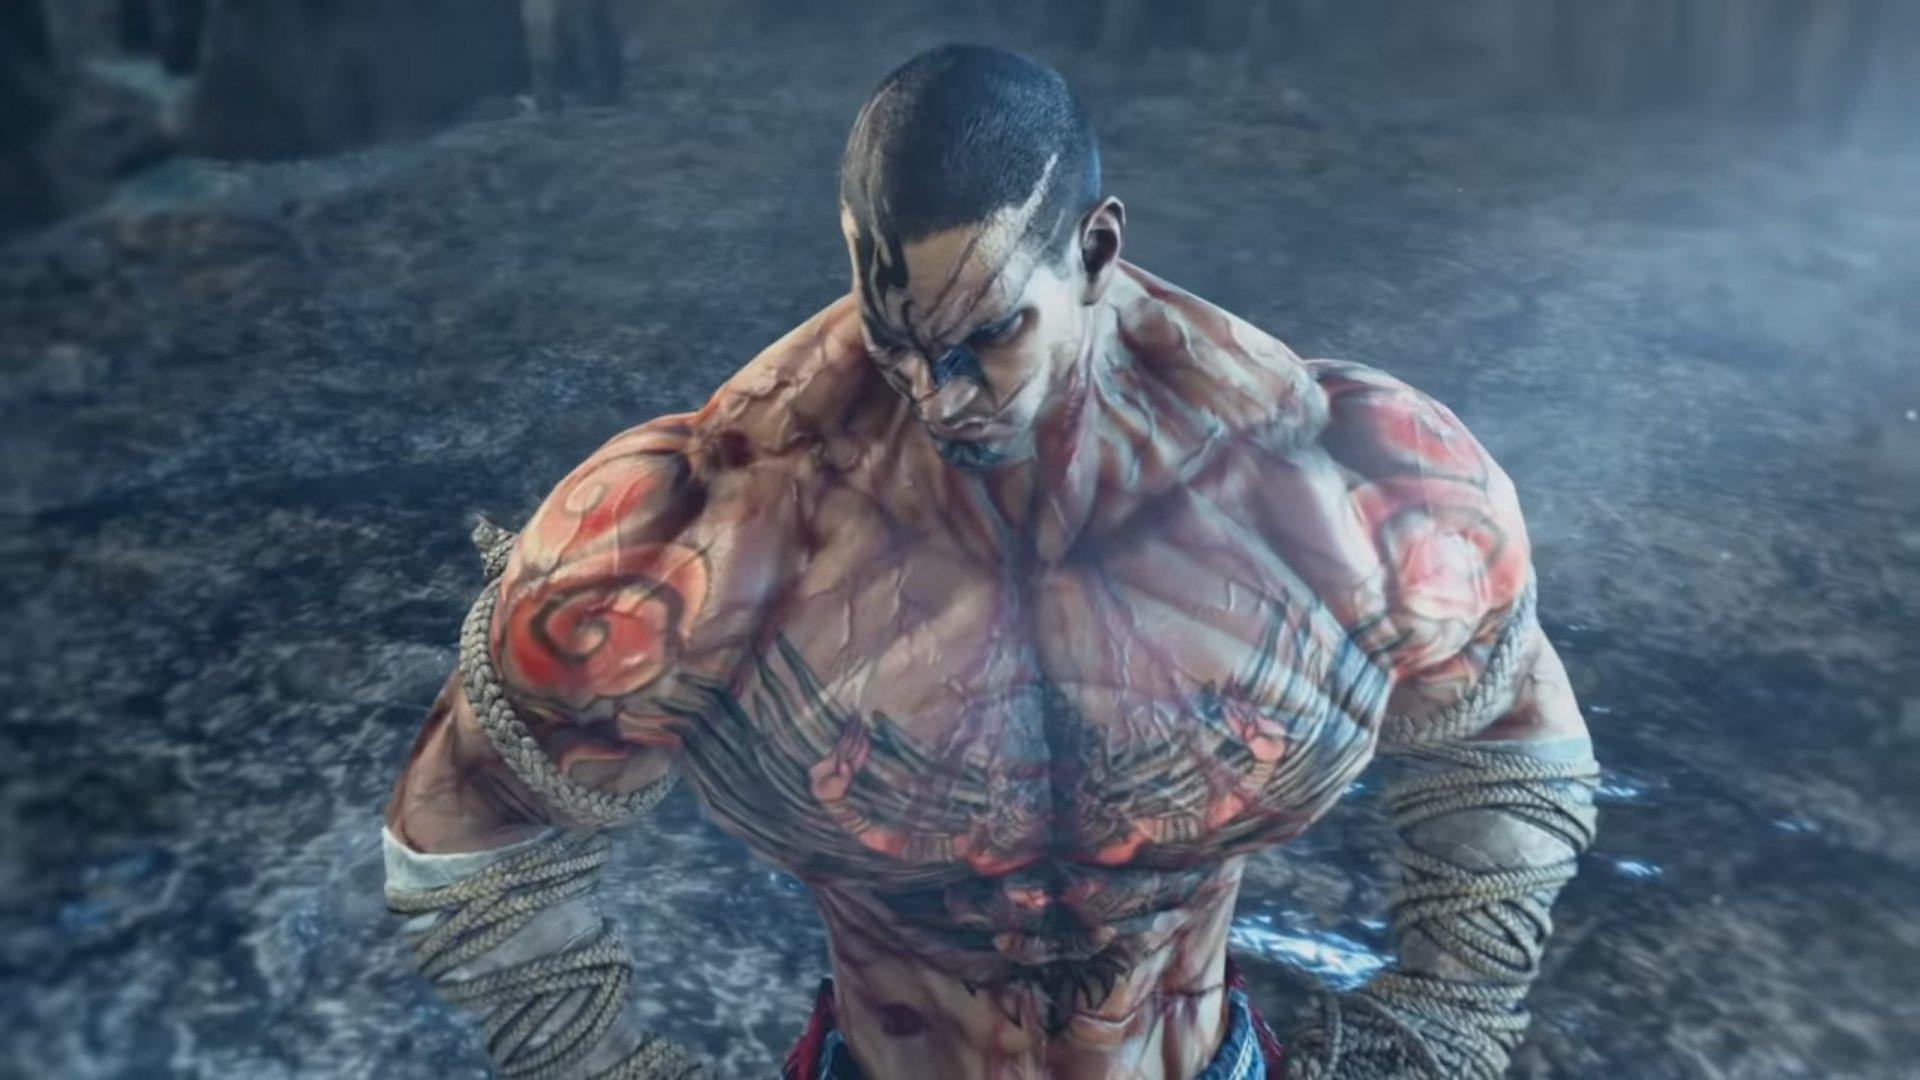 Fahkumram And Thailand Stage Will Round Out Tekken 7 Season 3